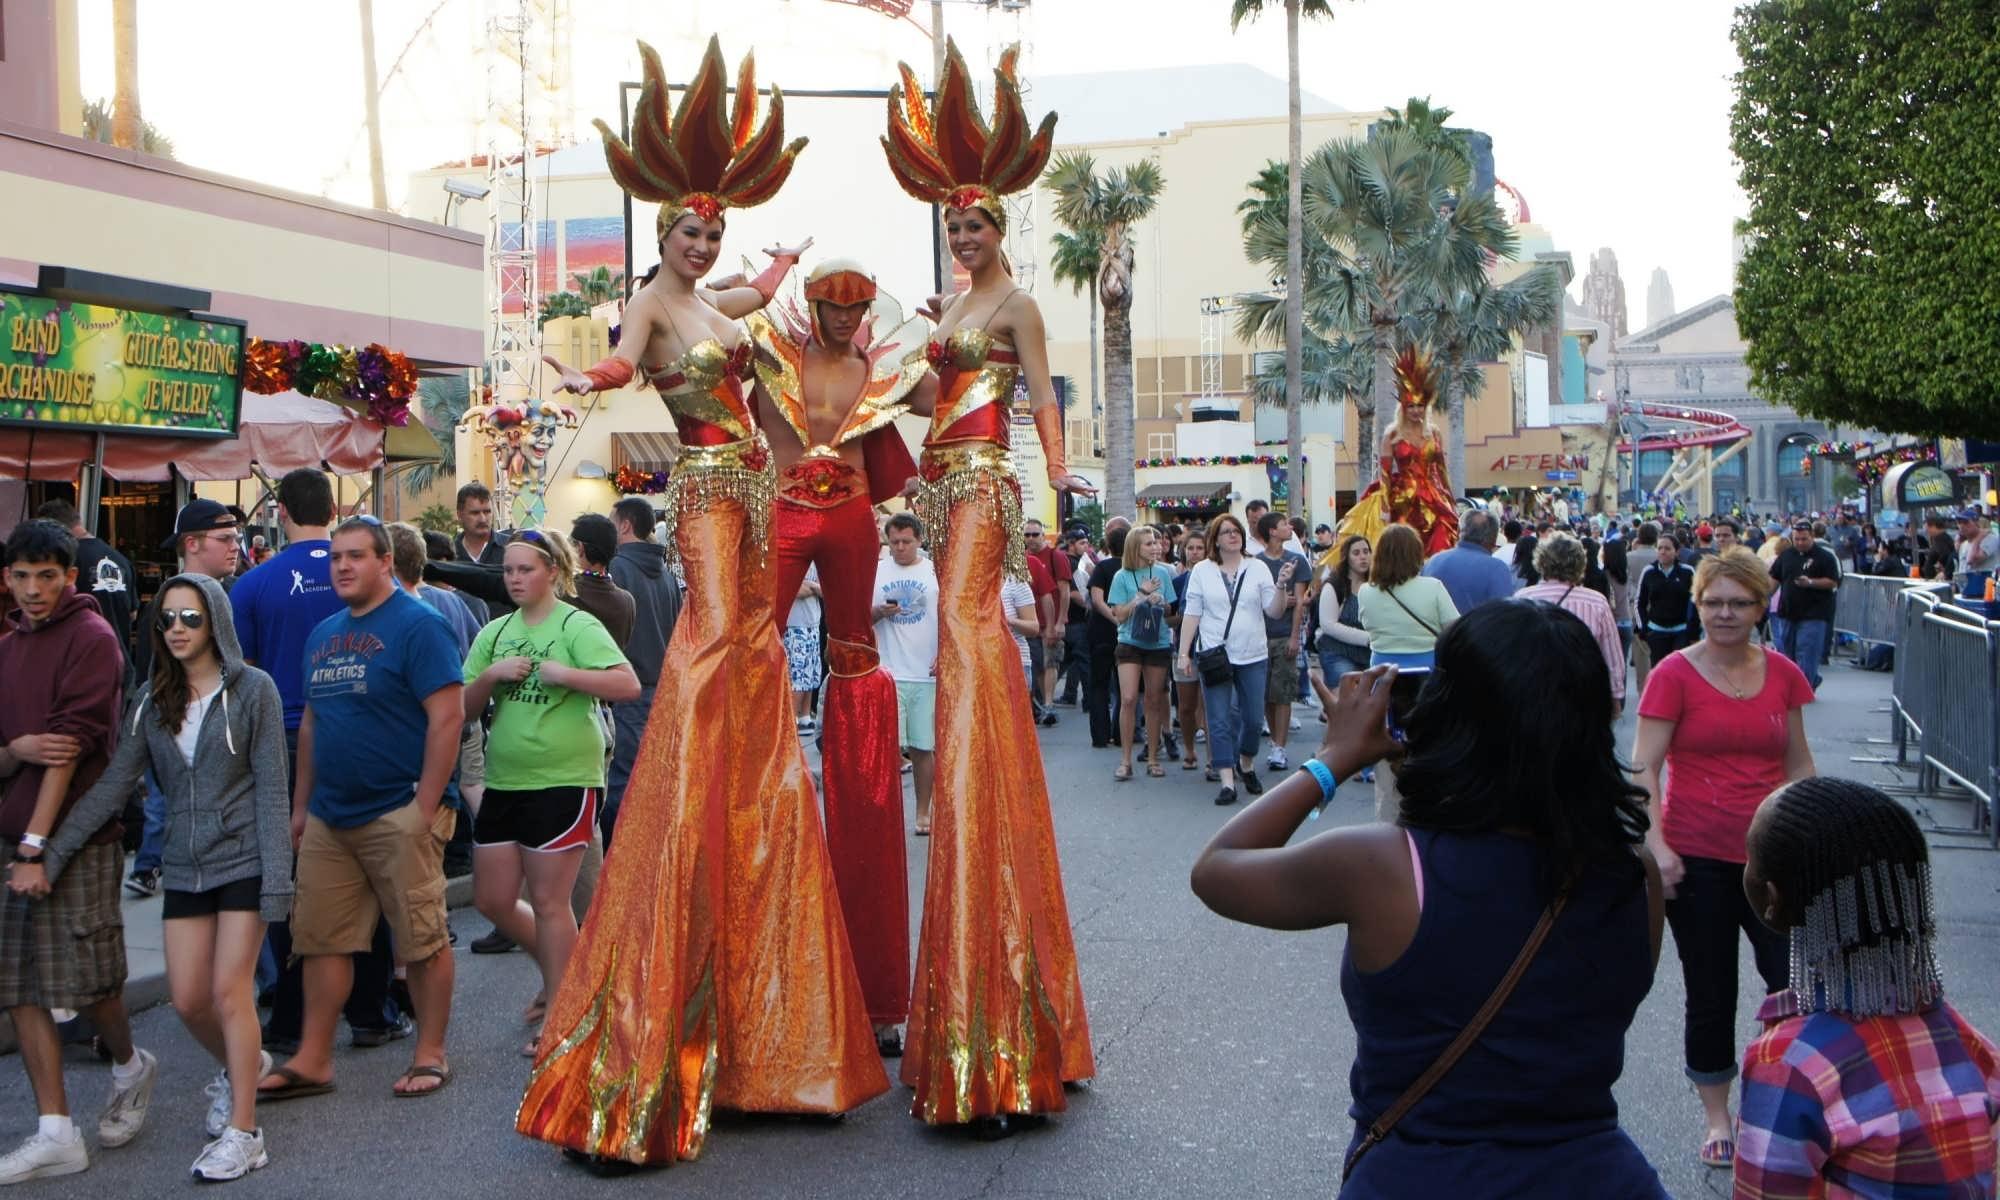 Universal Studios' Mardi Gras